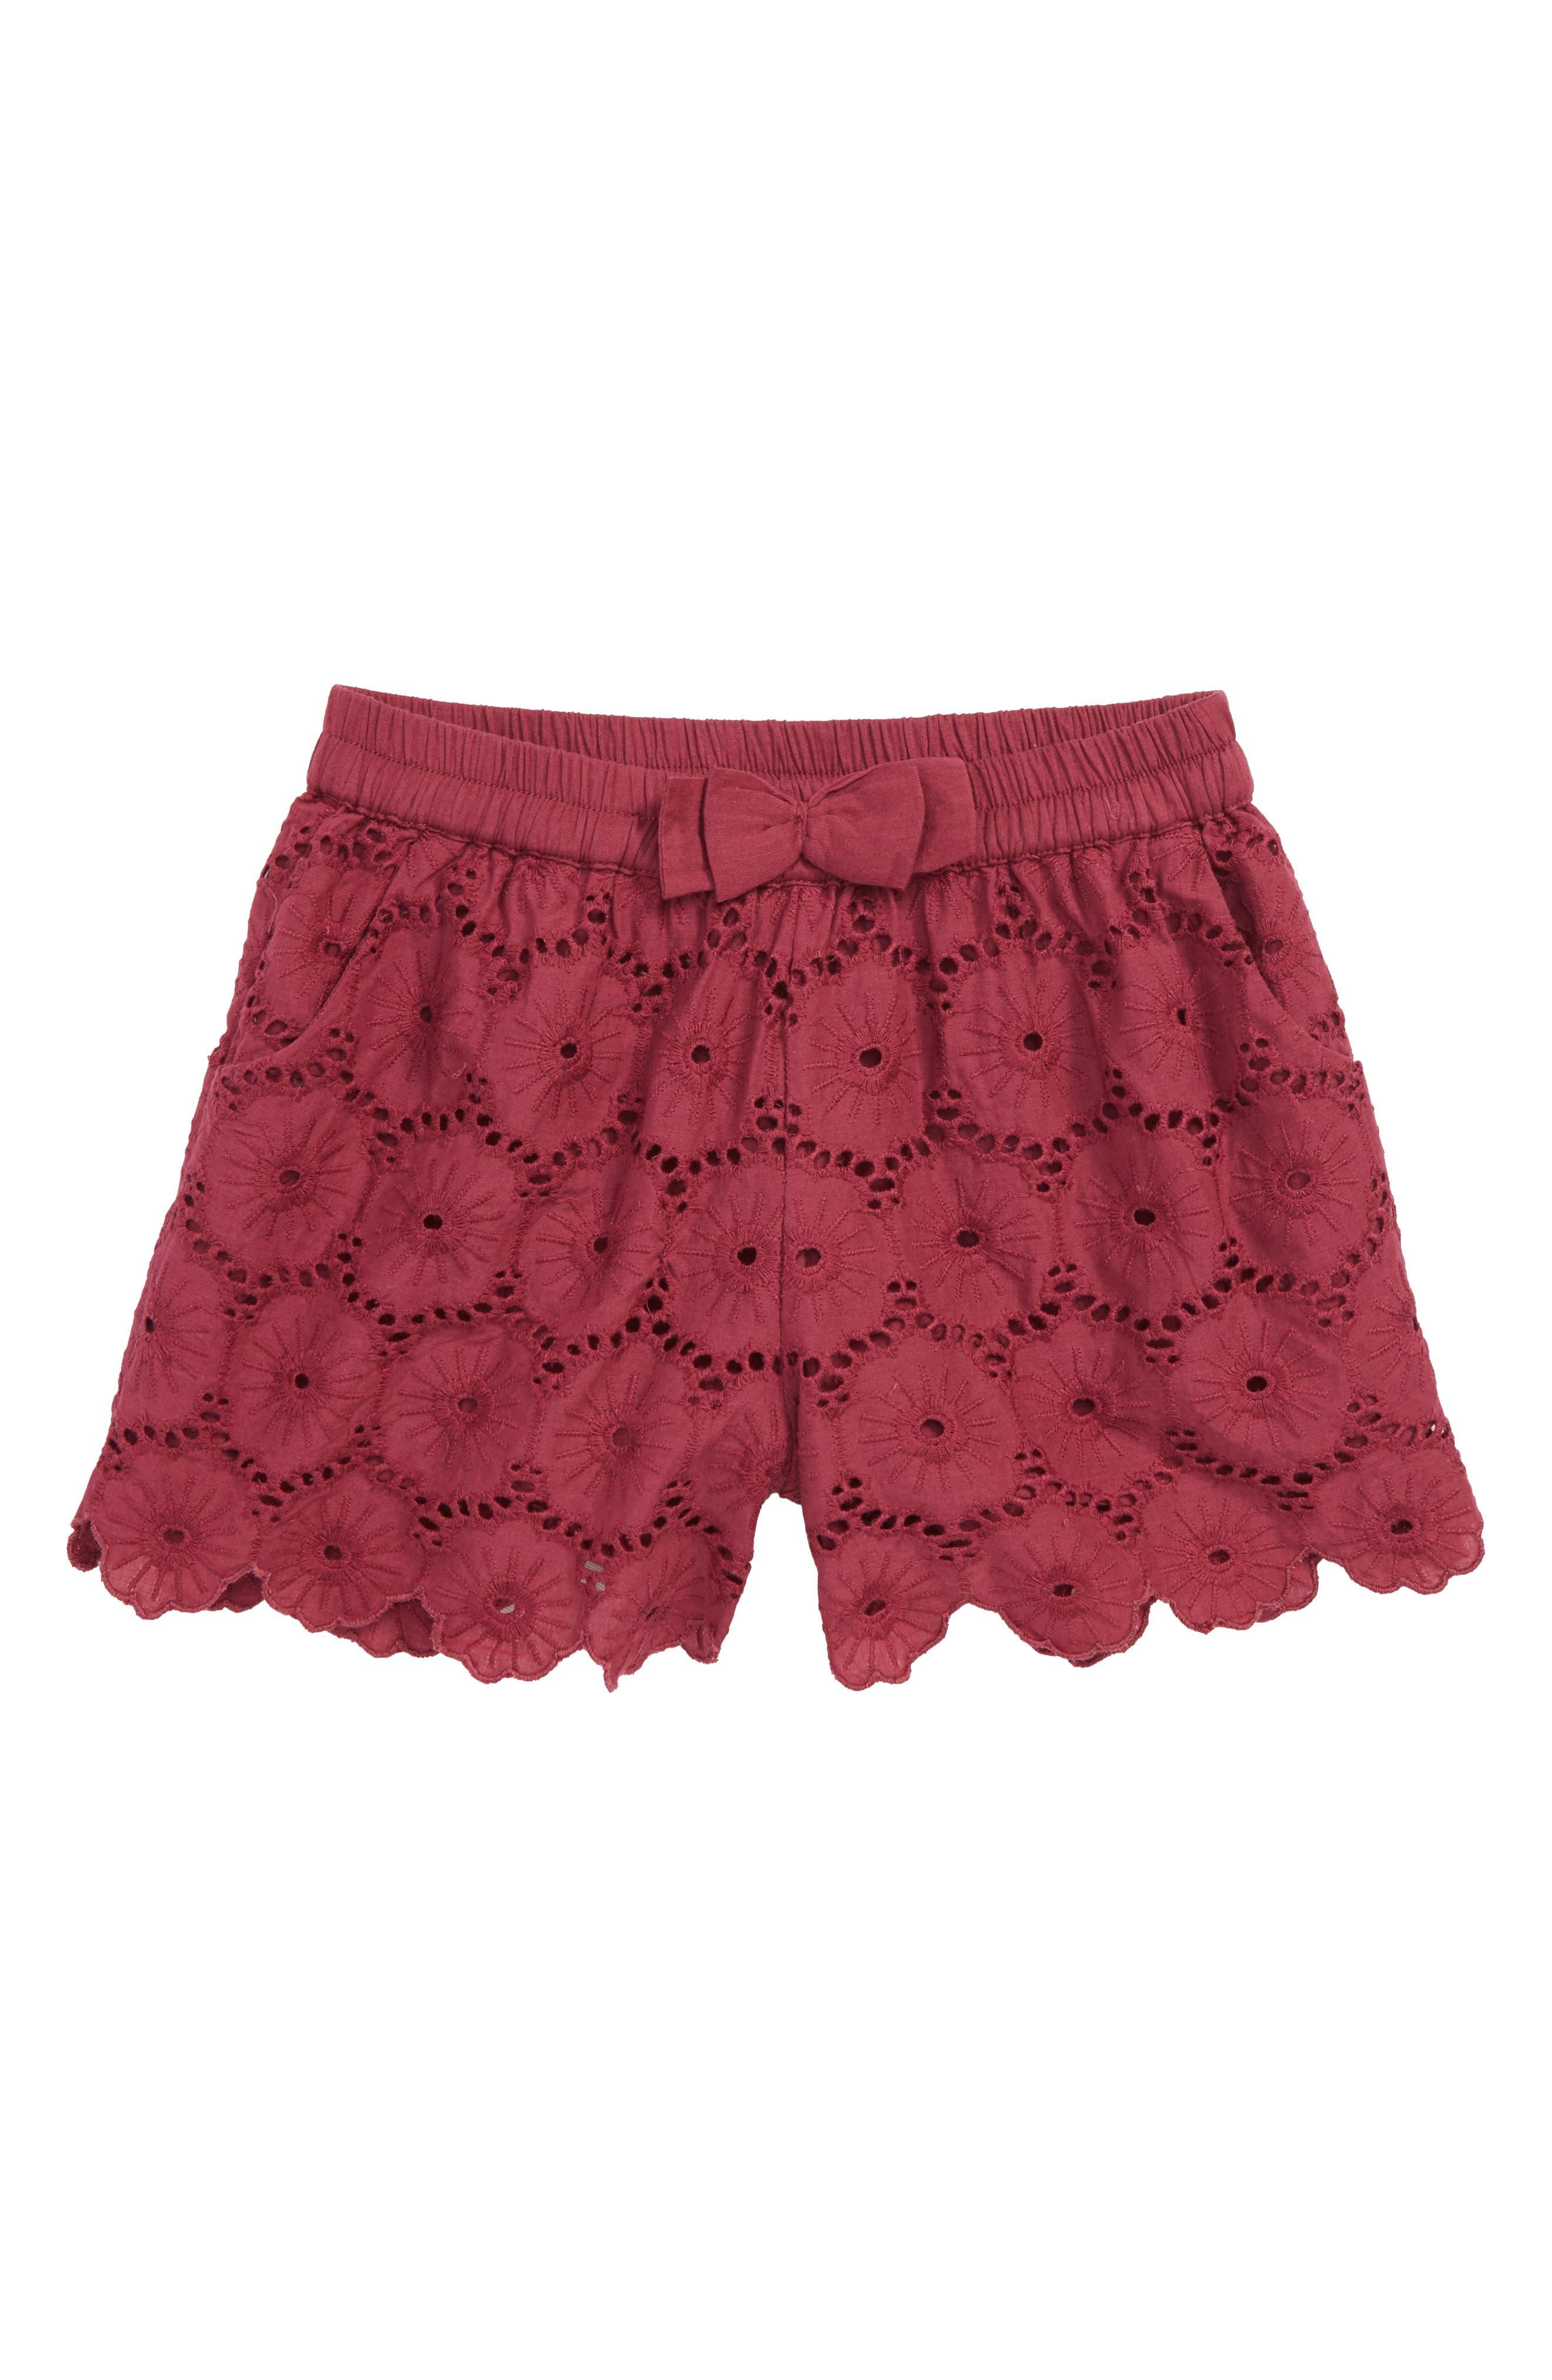 Christy Eyelet Shorts,                         Main,                         color, 930